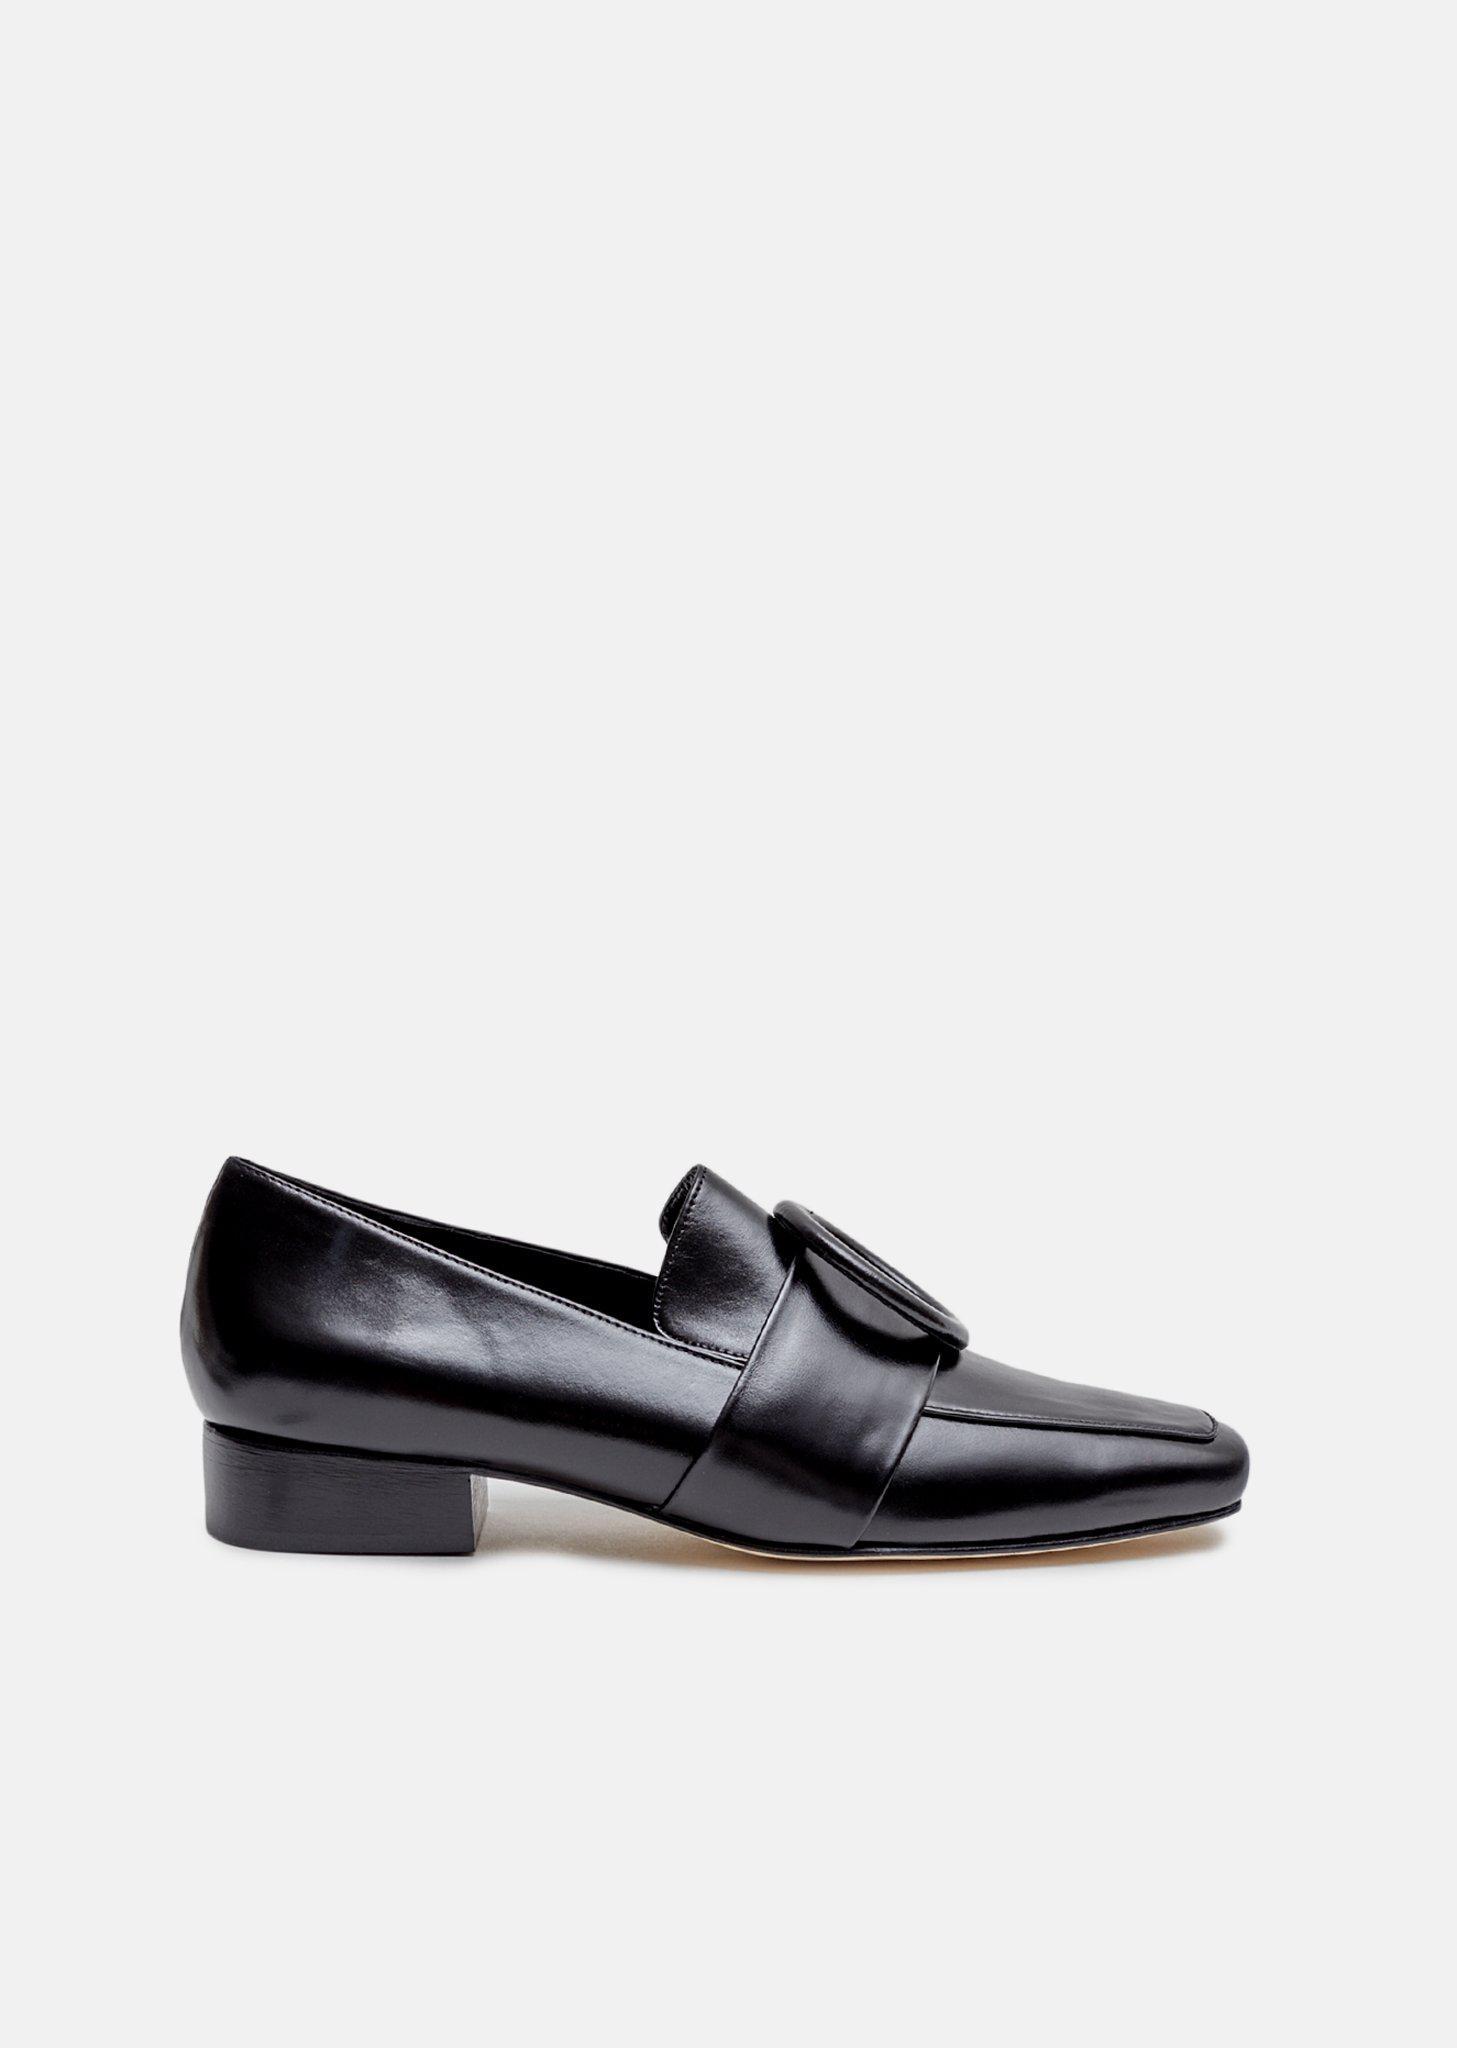 Harput Shadow loafers - Black DORATEYMUR Big Discount Discount Wiki Outlet Geniue Stockist 2h40cHXY0